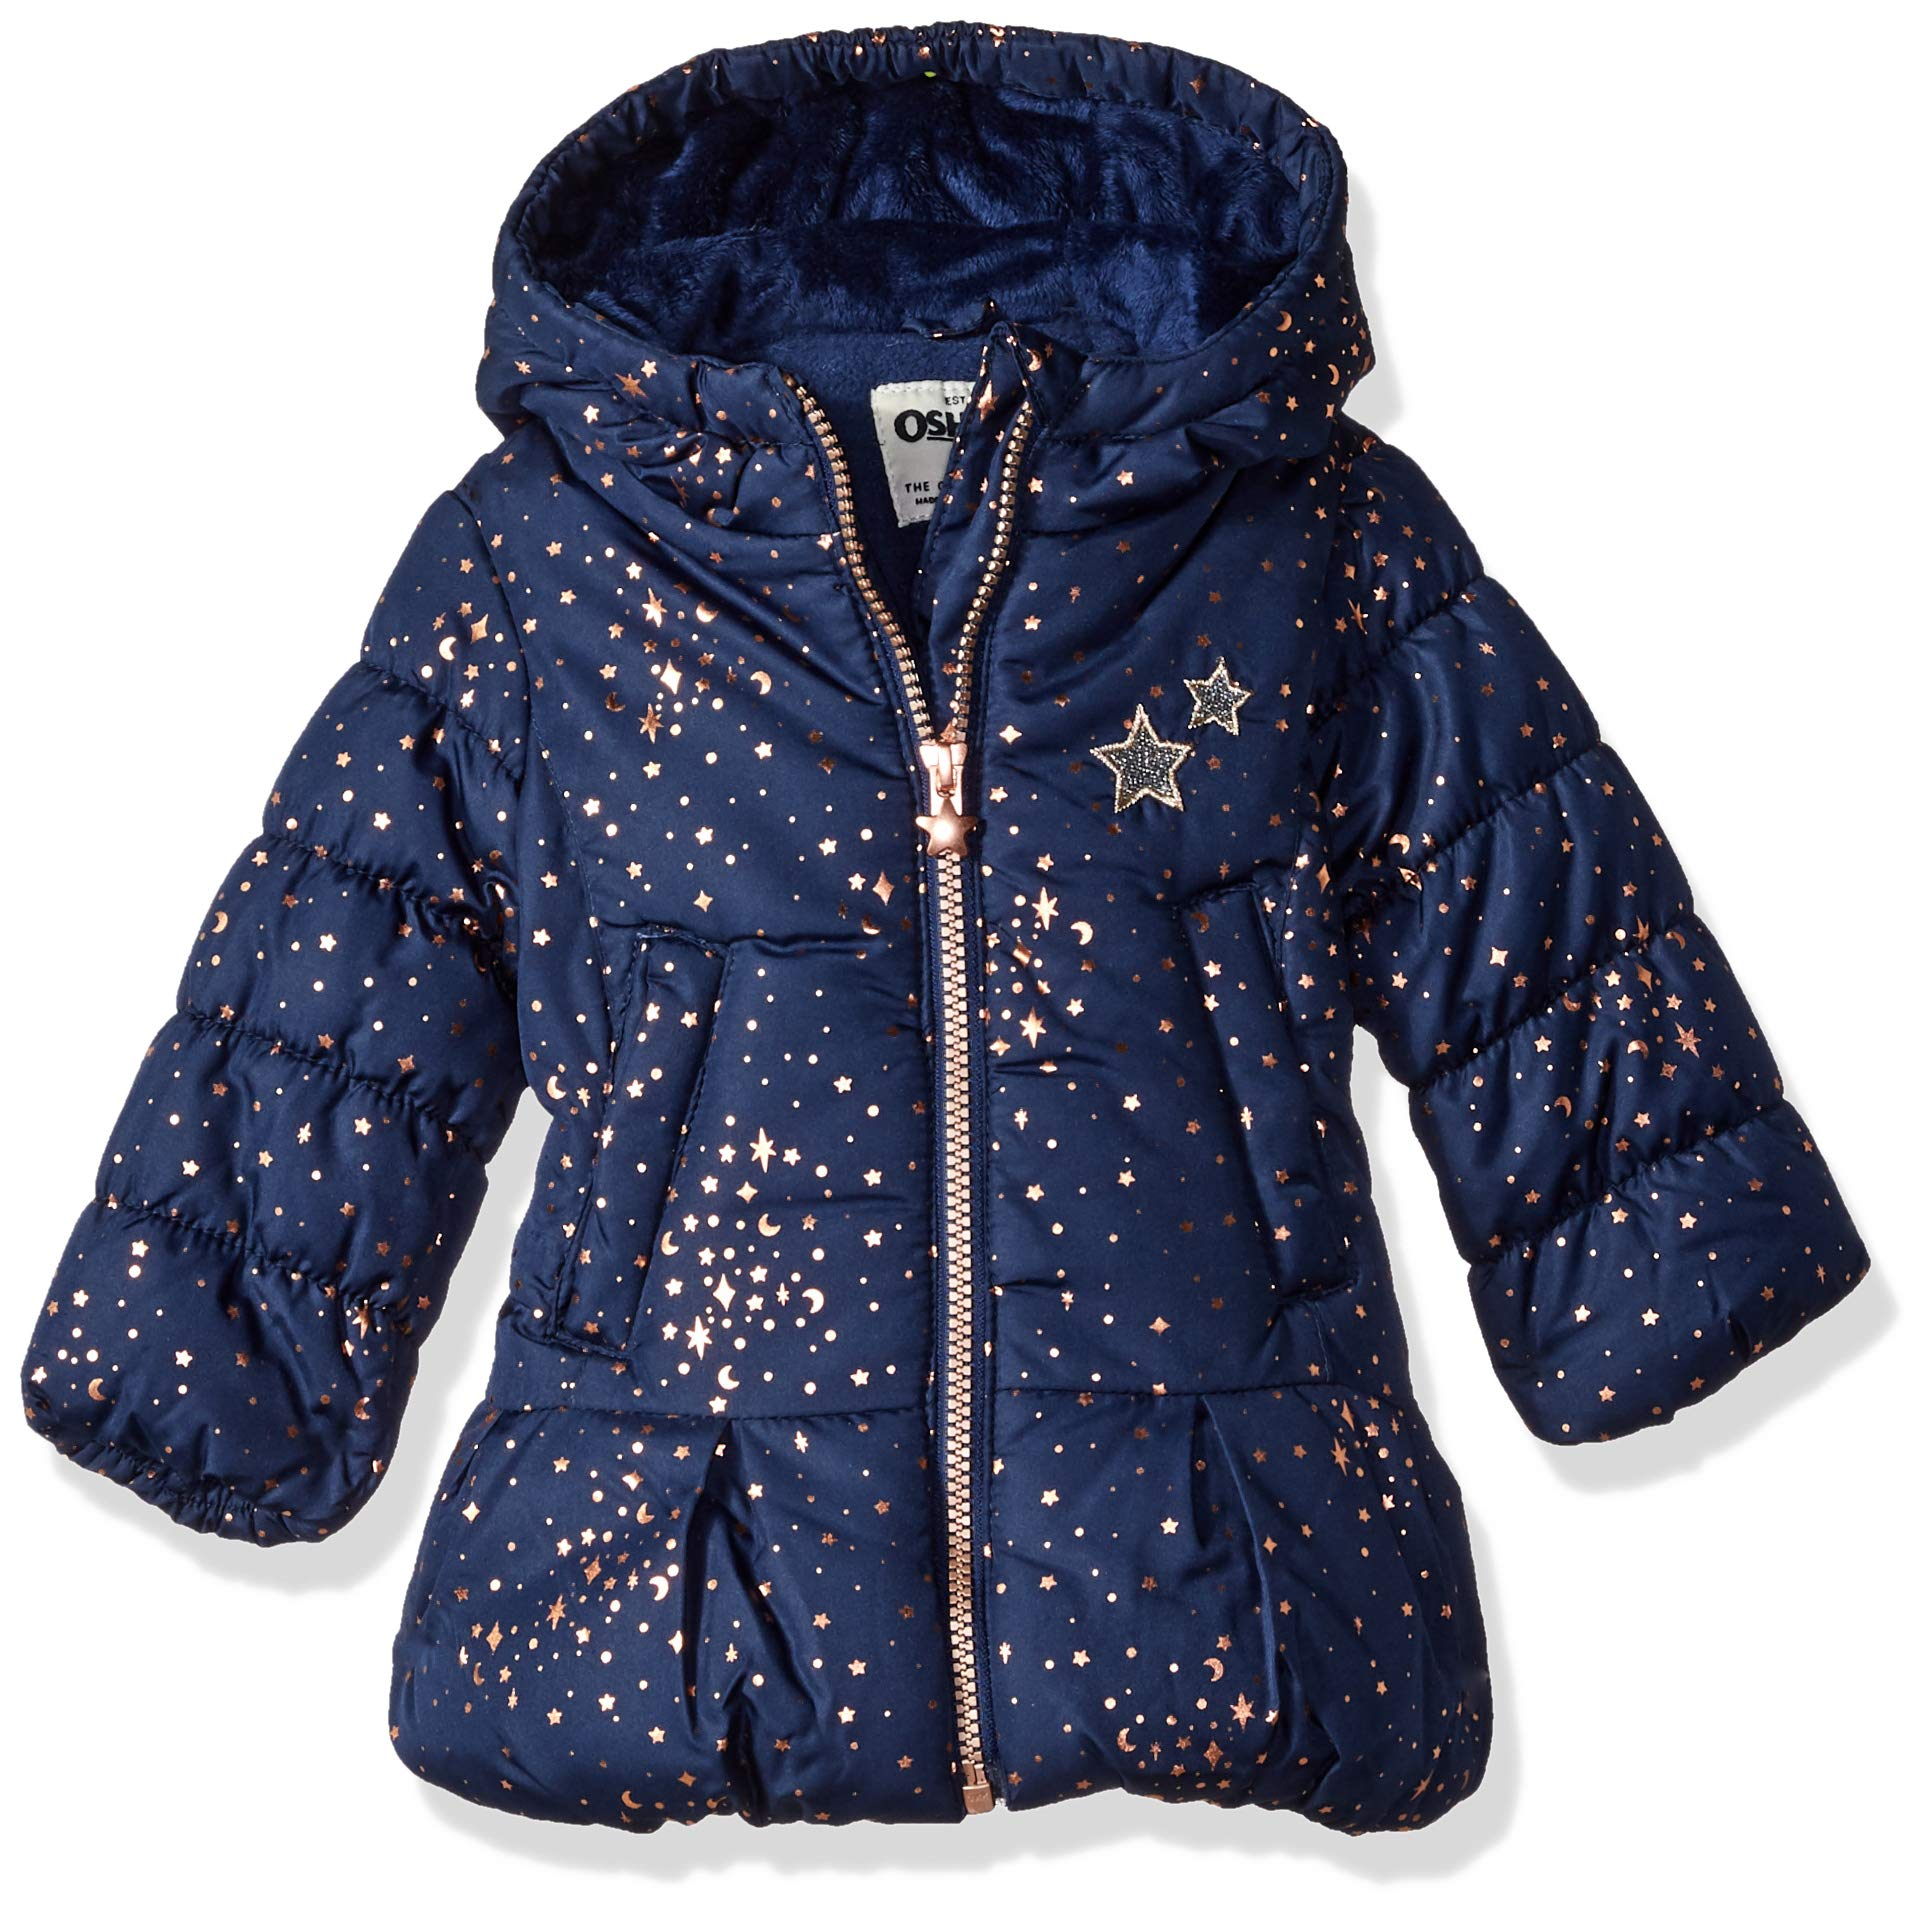 Osh Kosh Baby Girls Hooded Peplum Jacket Coat, Navy, 12M